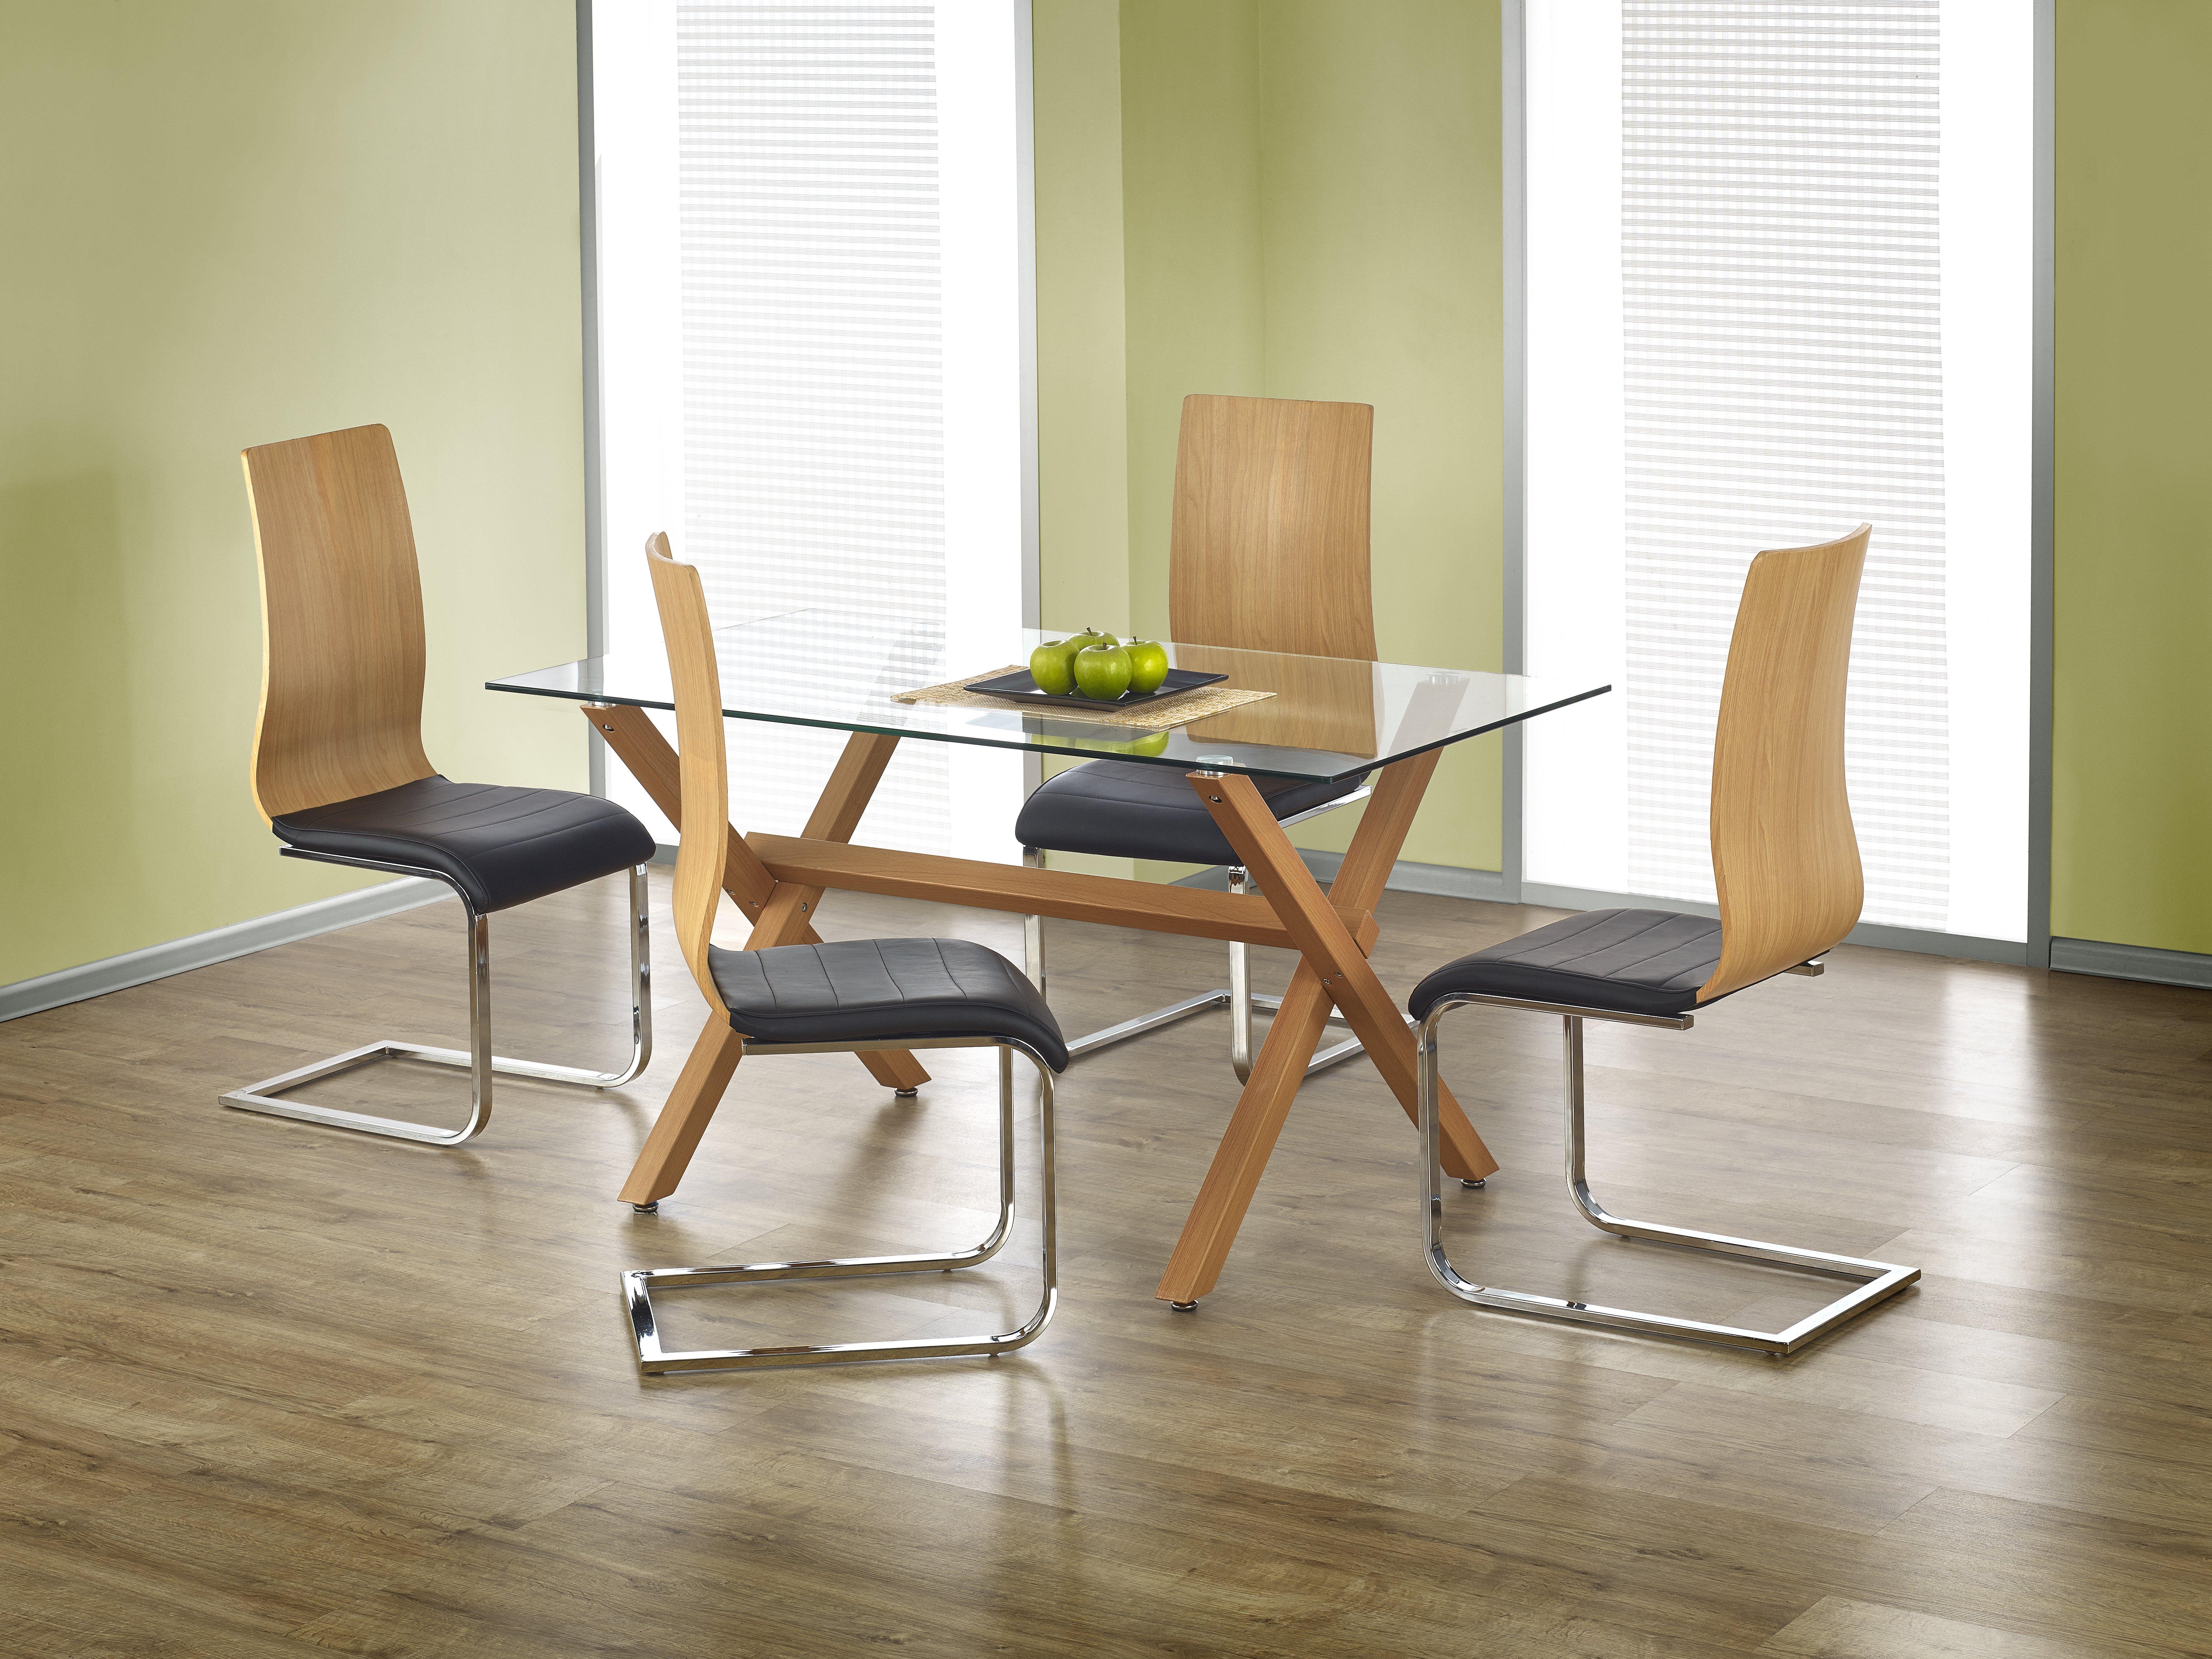 Jídelní stůl - Halmar - Gartner (pro 6 osob)